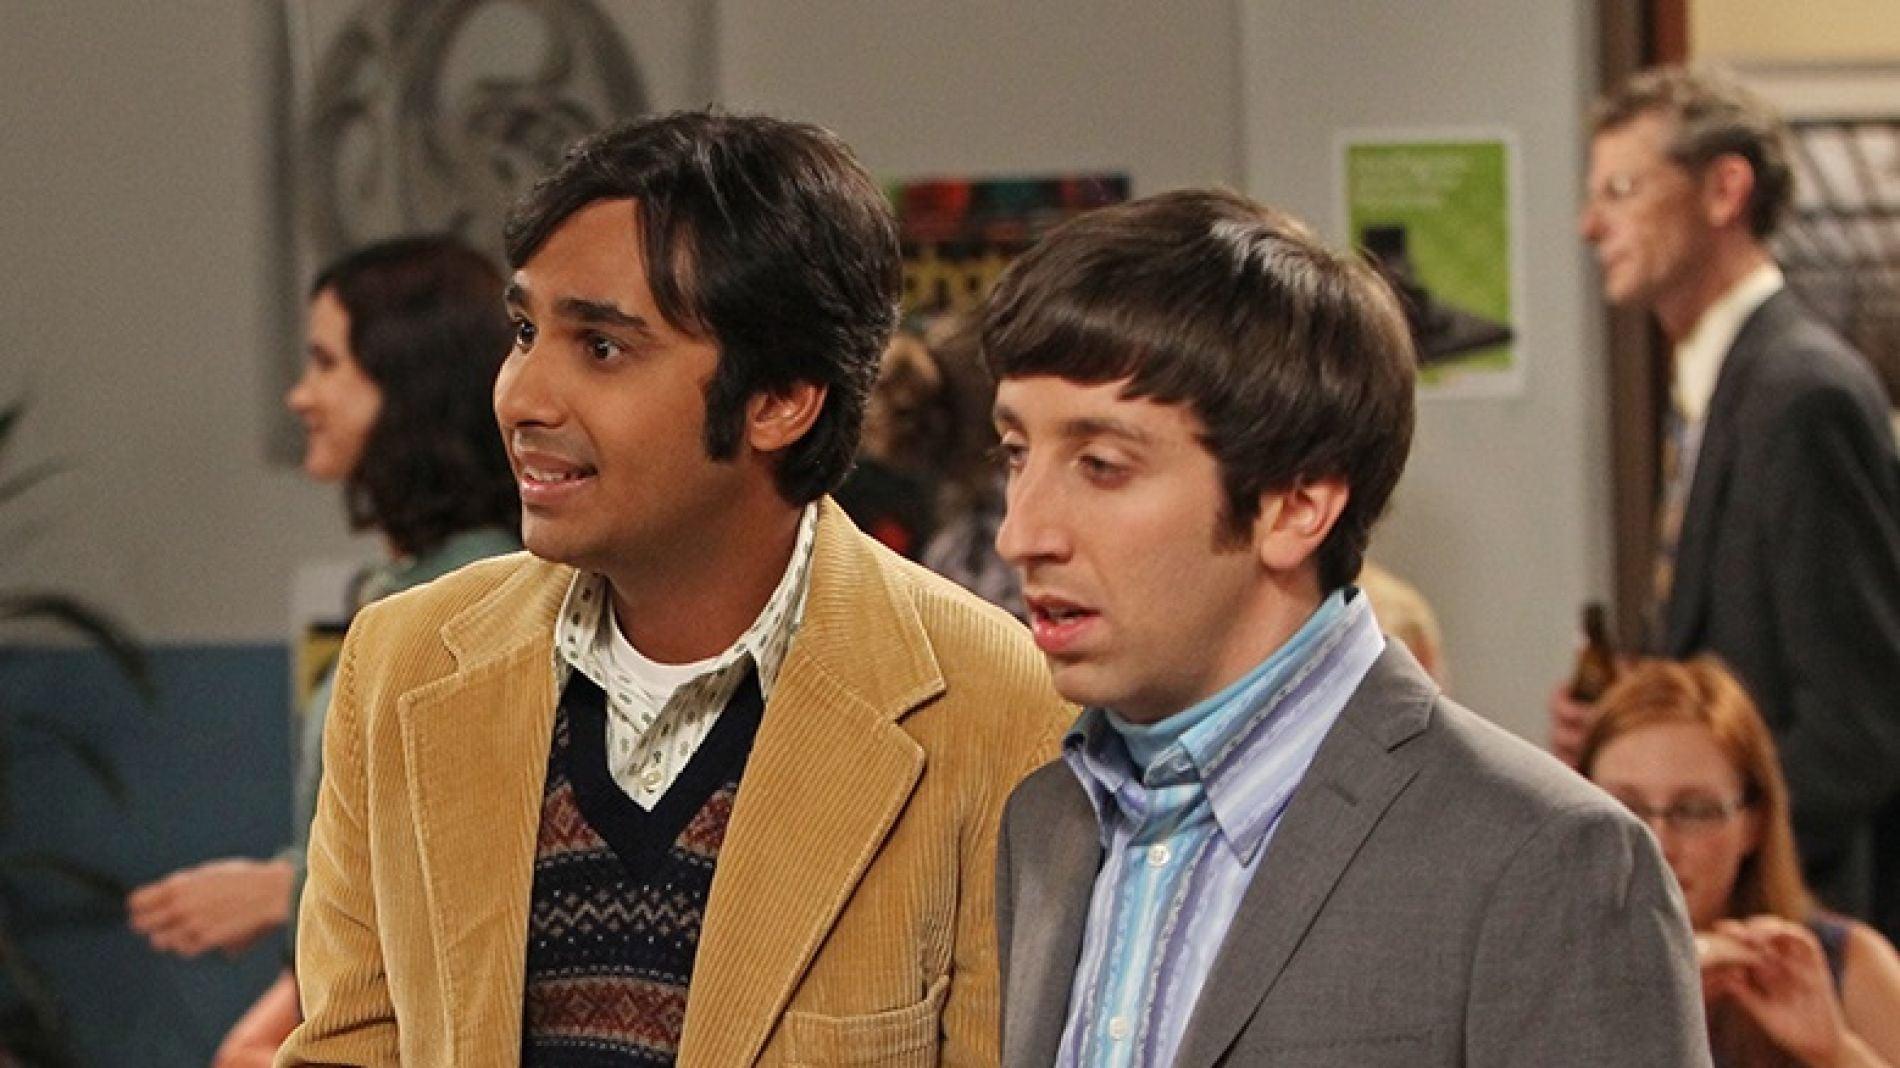 Kunal Nayyar y Simon Helberg como Raj y Howard en 'The Big Bang Theory'